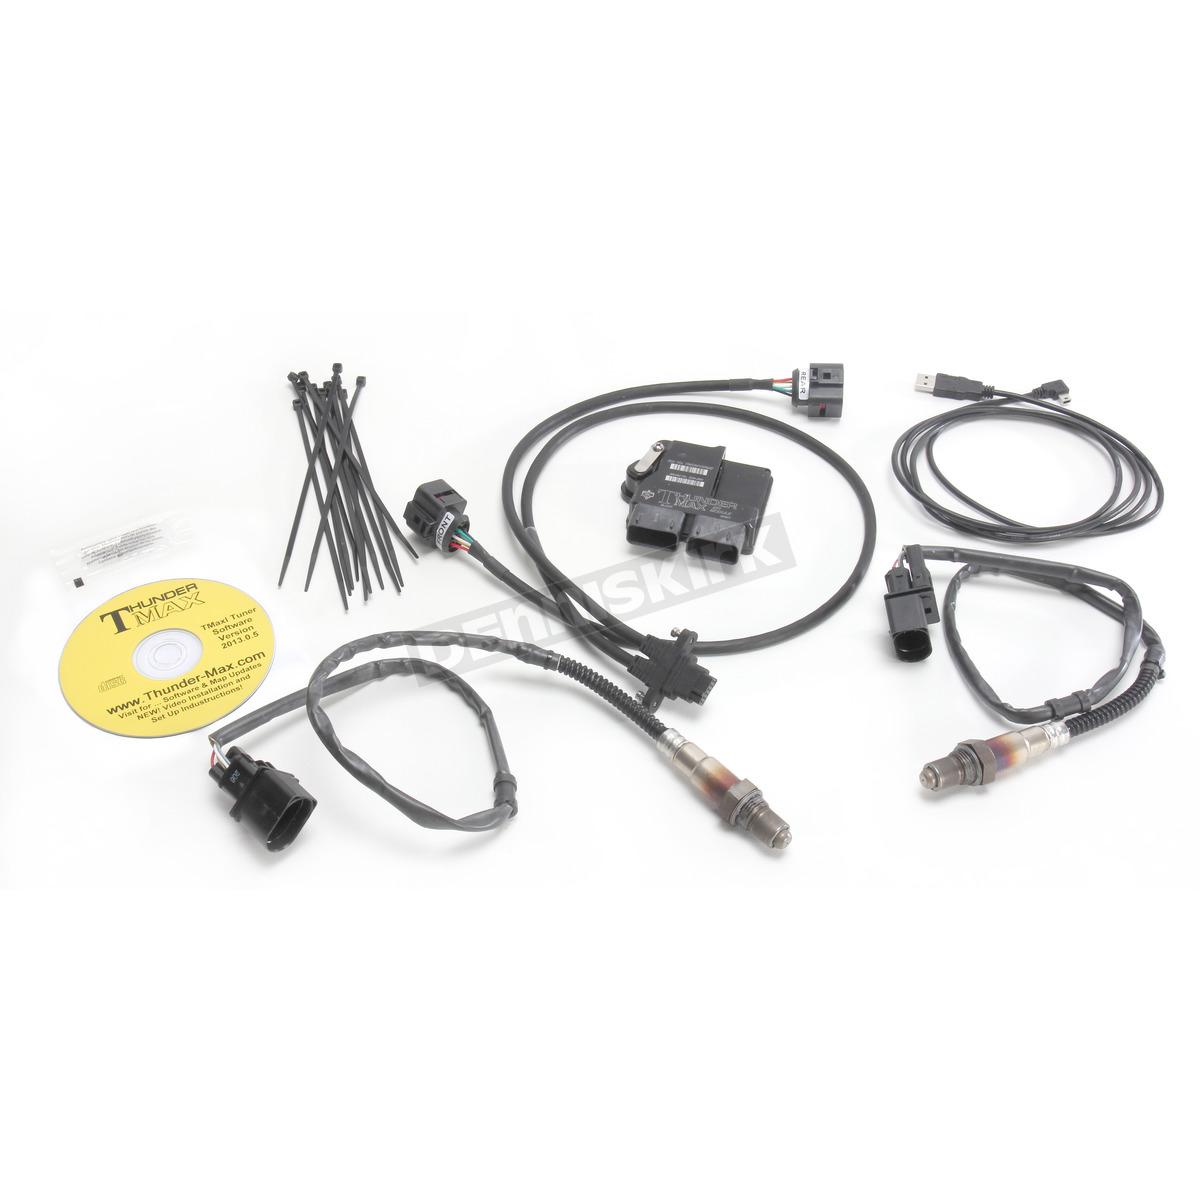 49cc terminator mini chopper wiring diagram 89 honda civic radio chinese wire auto